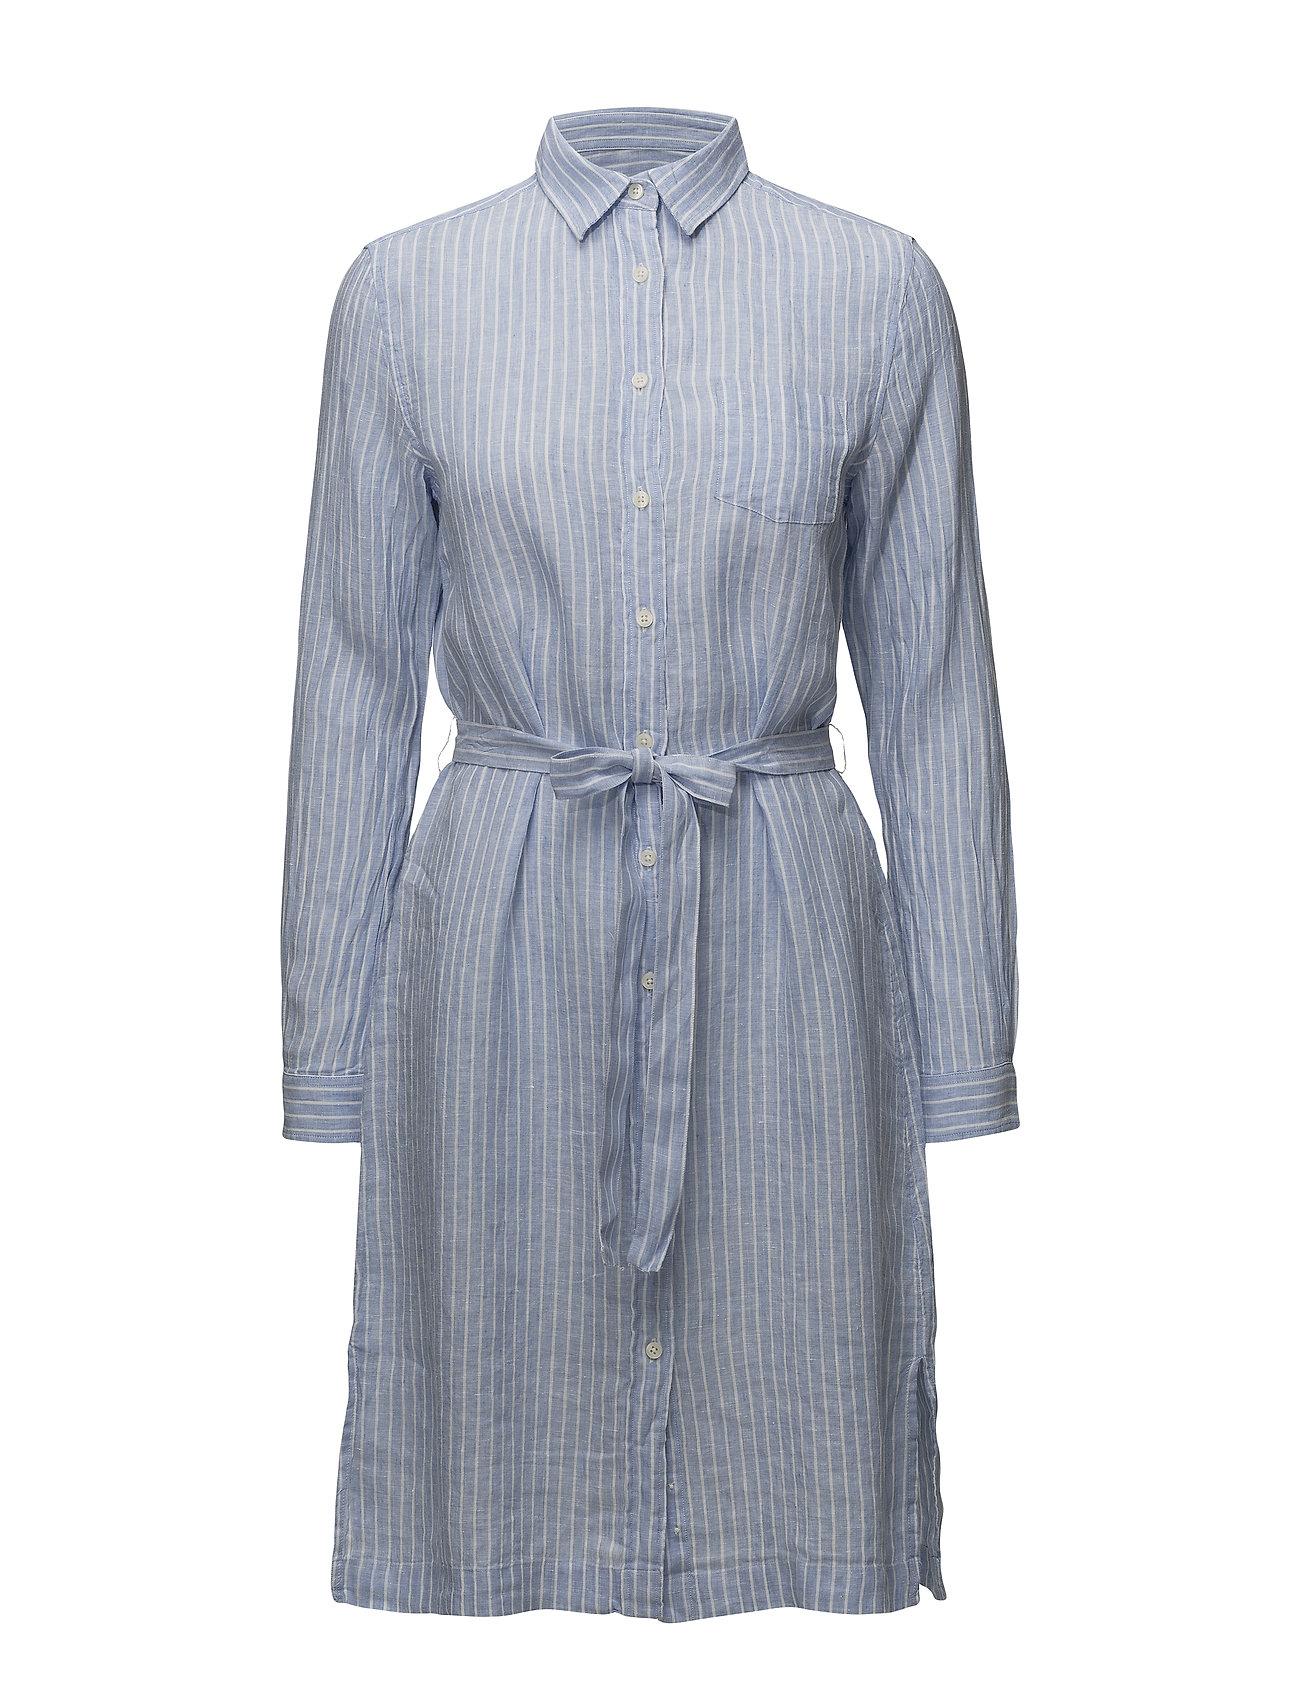 Gant O2. STRIPED LINEN SHIRT DRESS - CAPRI BLUE